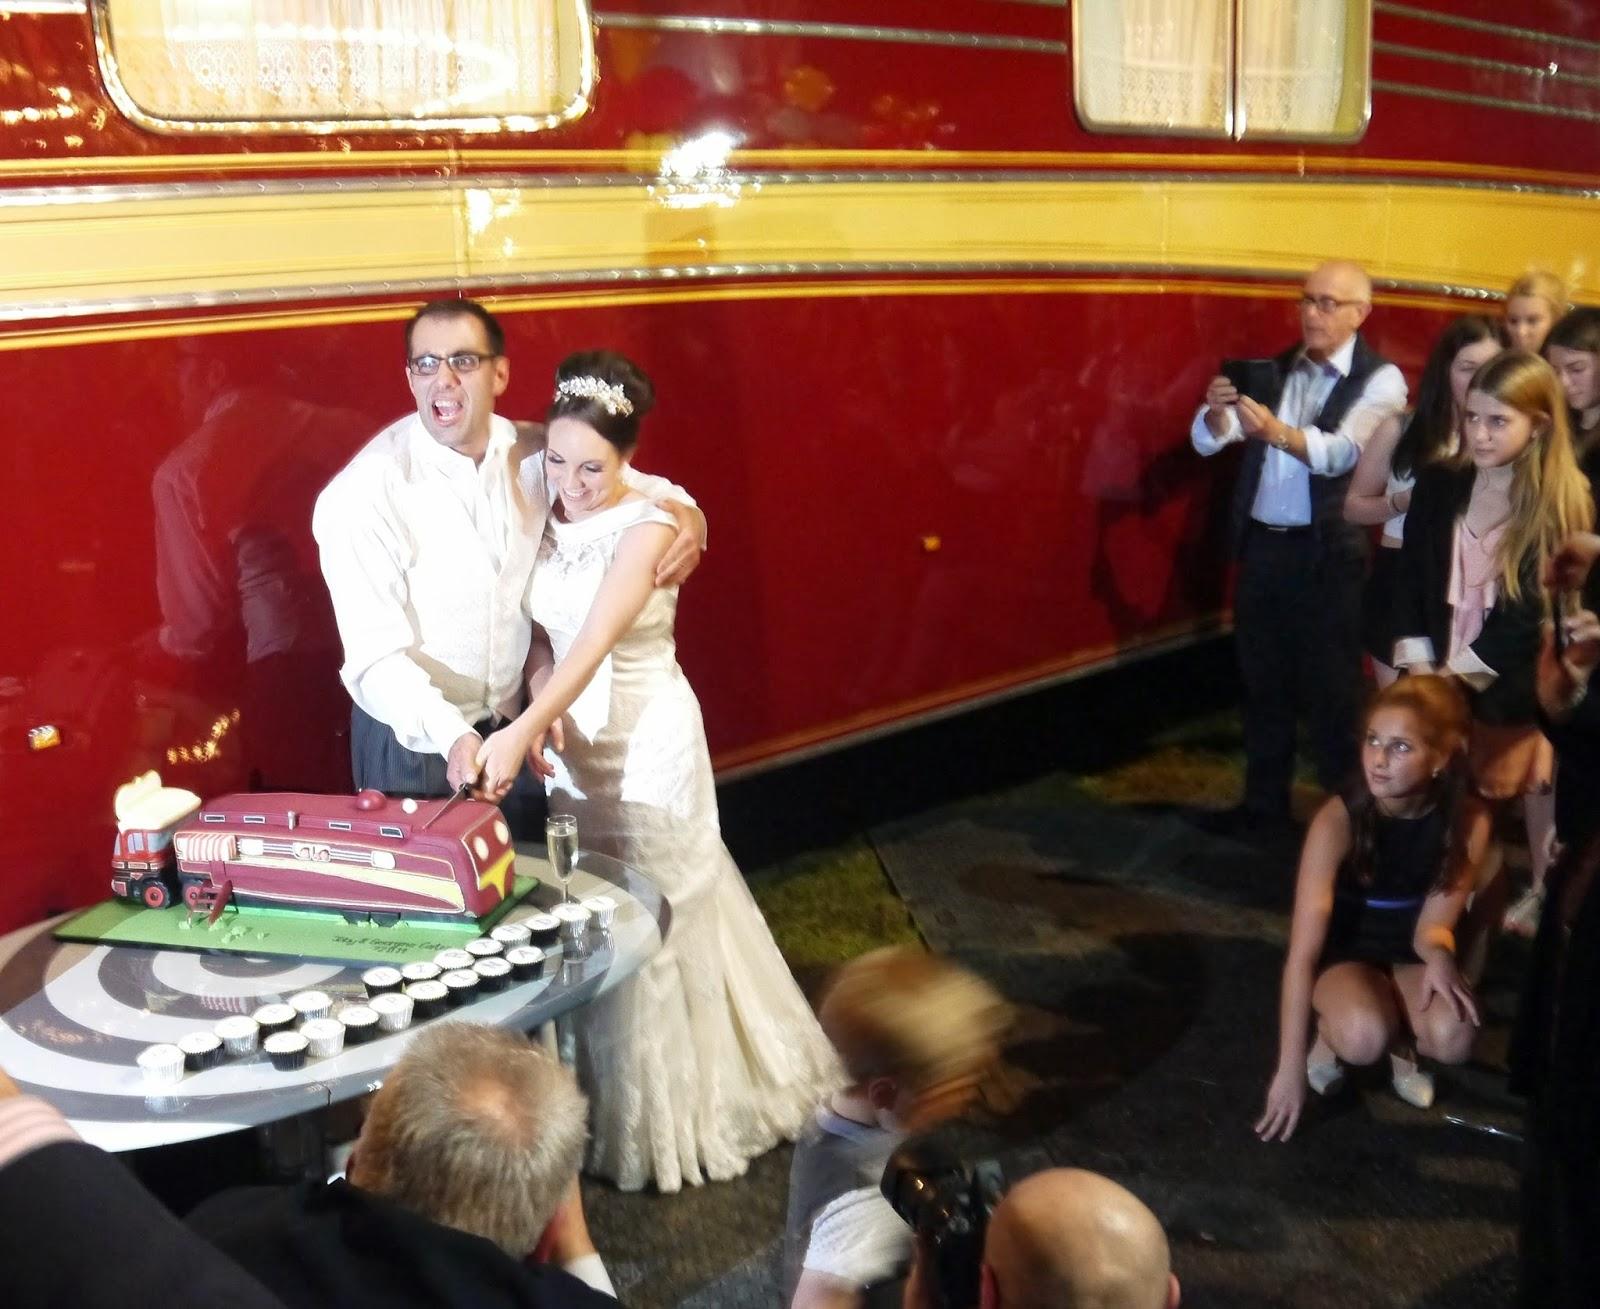 Carters Steam Fair Wedding - Cutting the wedding cake